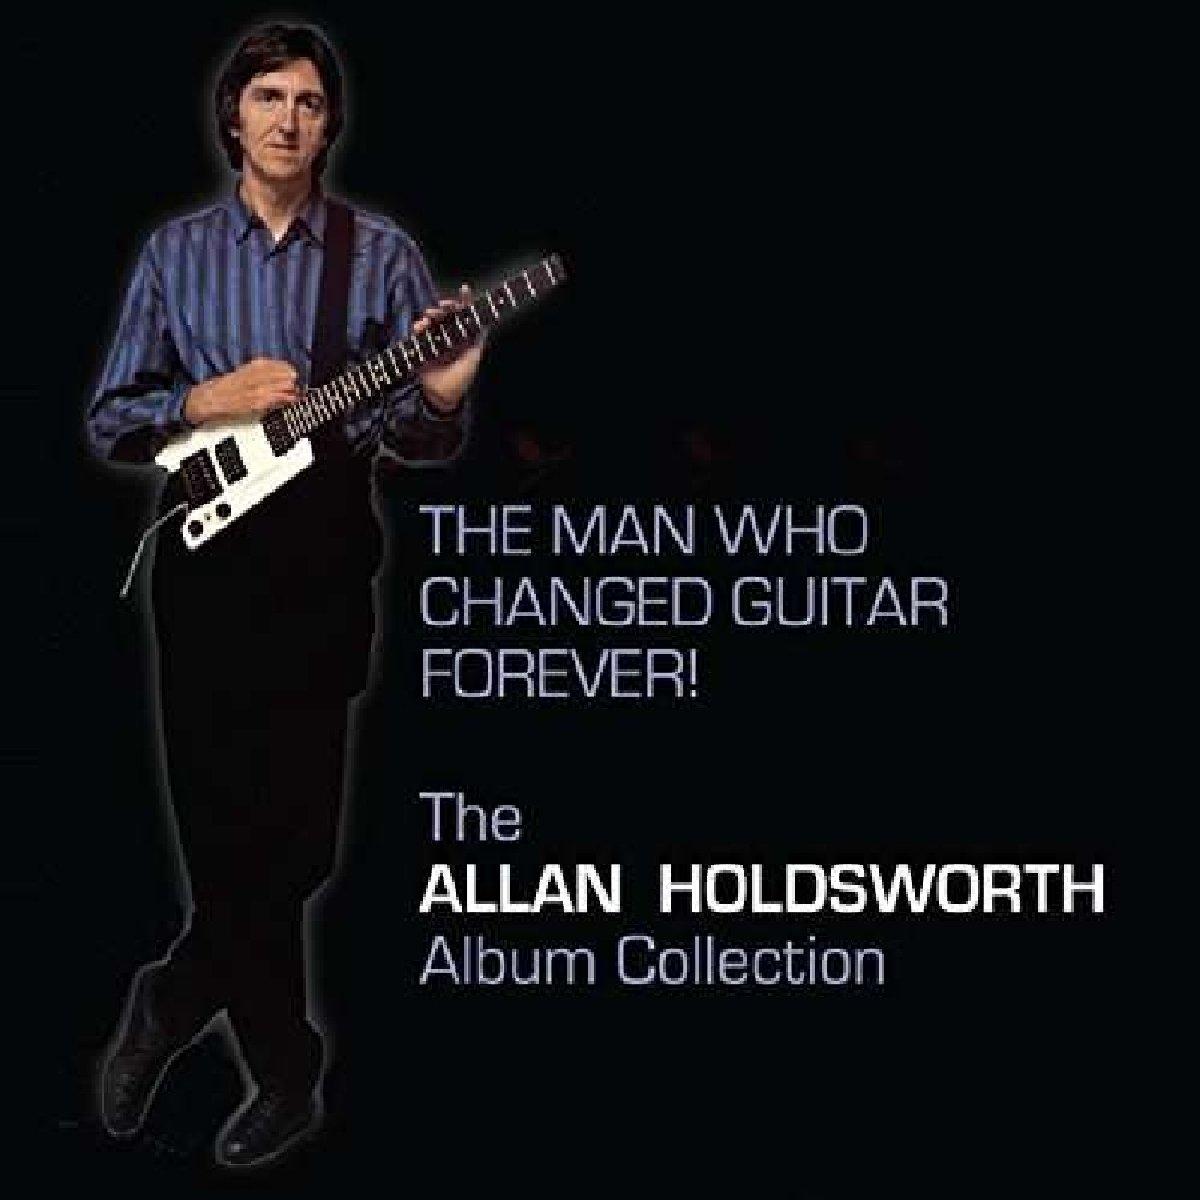 CD : Allan Holdsworth - The Man Who Changed Guitar Forever (Bonus Tracks, Boxed Set, 12 Disc)